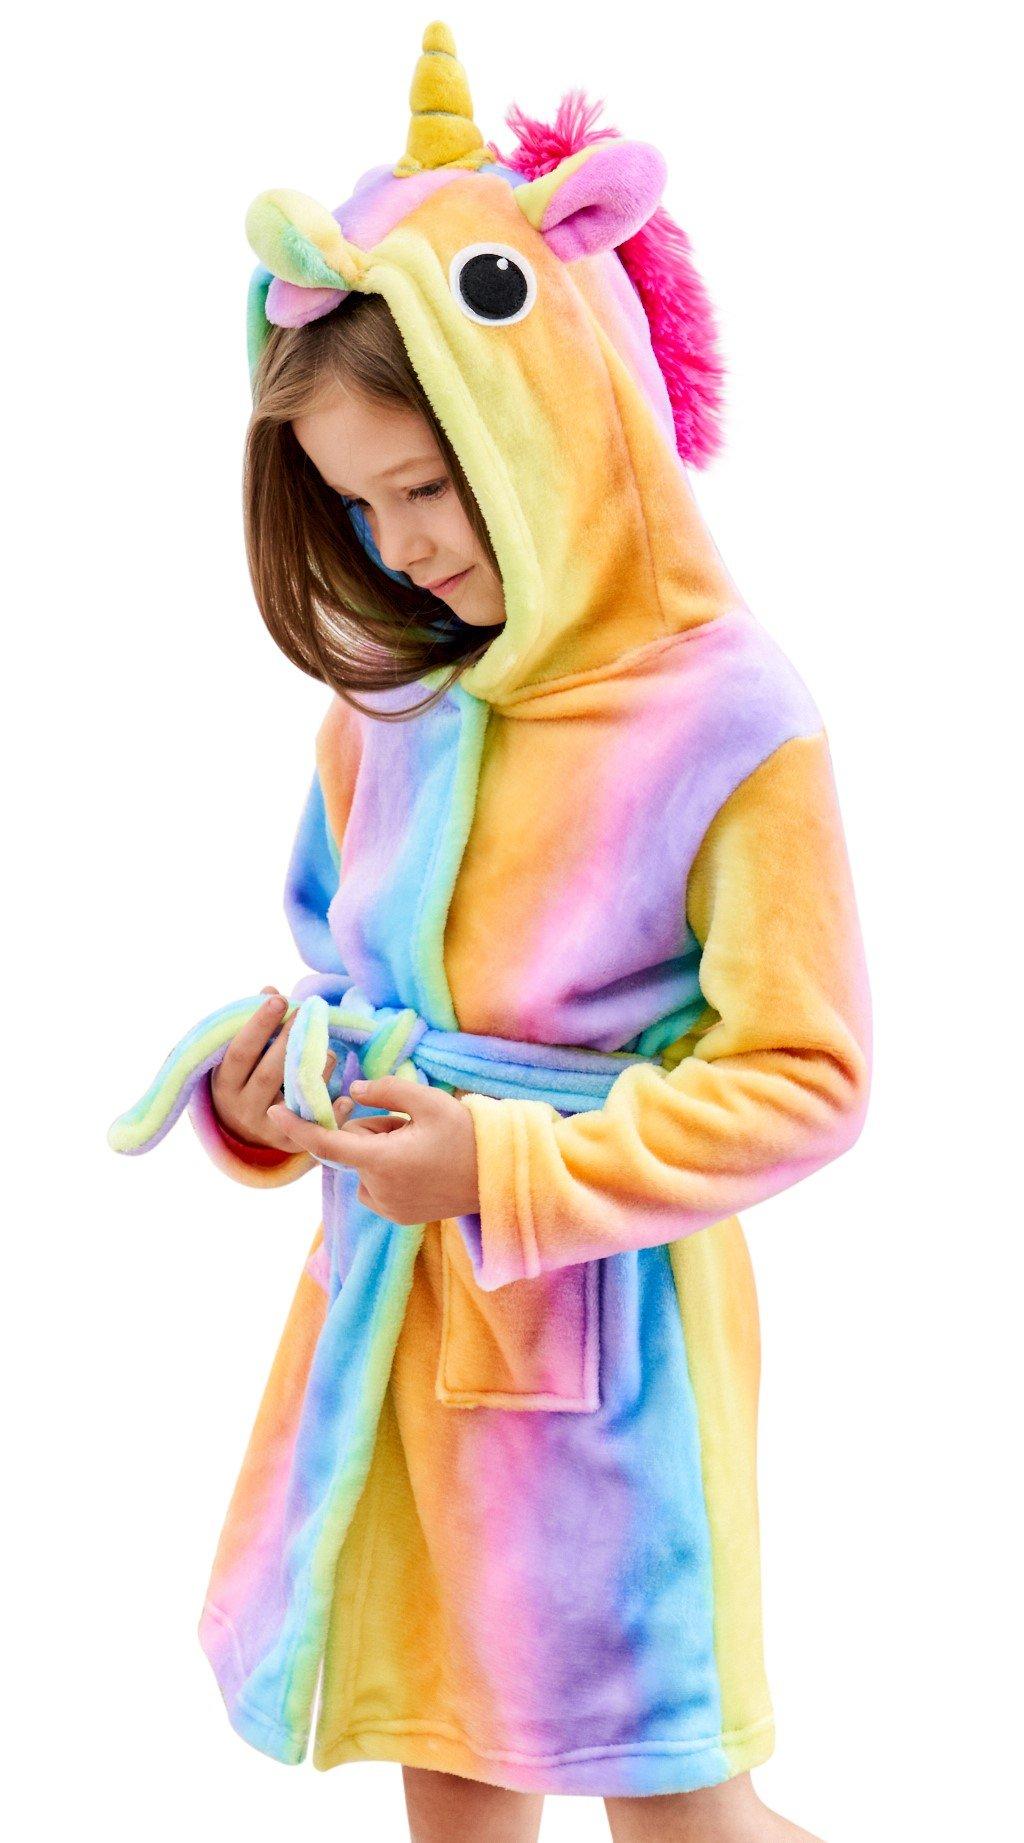 Soft Unicorn Hooded Bathrobe Sleepwear - Unicorn Gifts for Girls (7-9 Years, Rainbow) by Doctor Unicorn